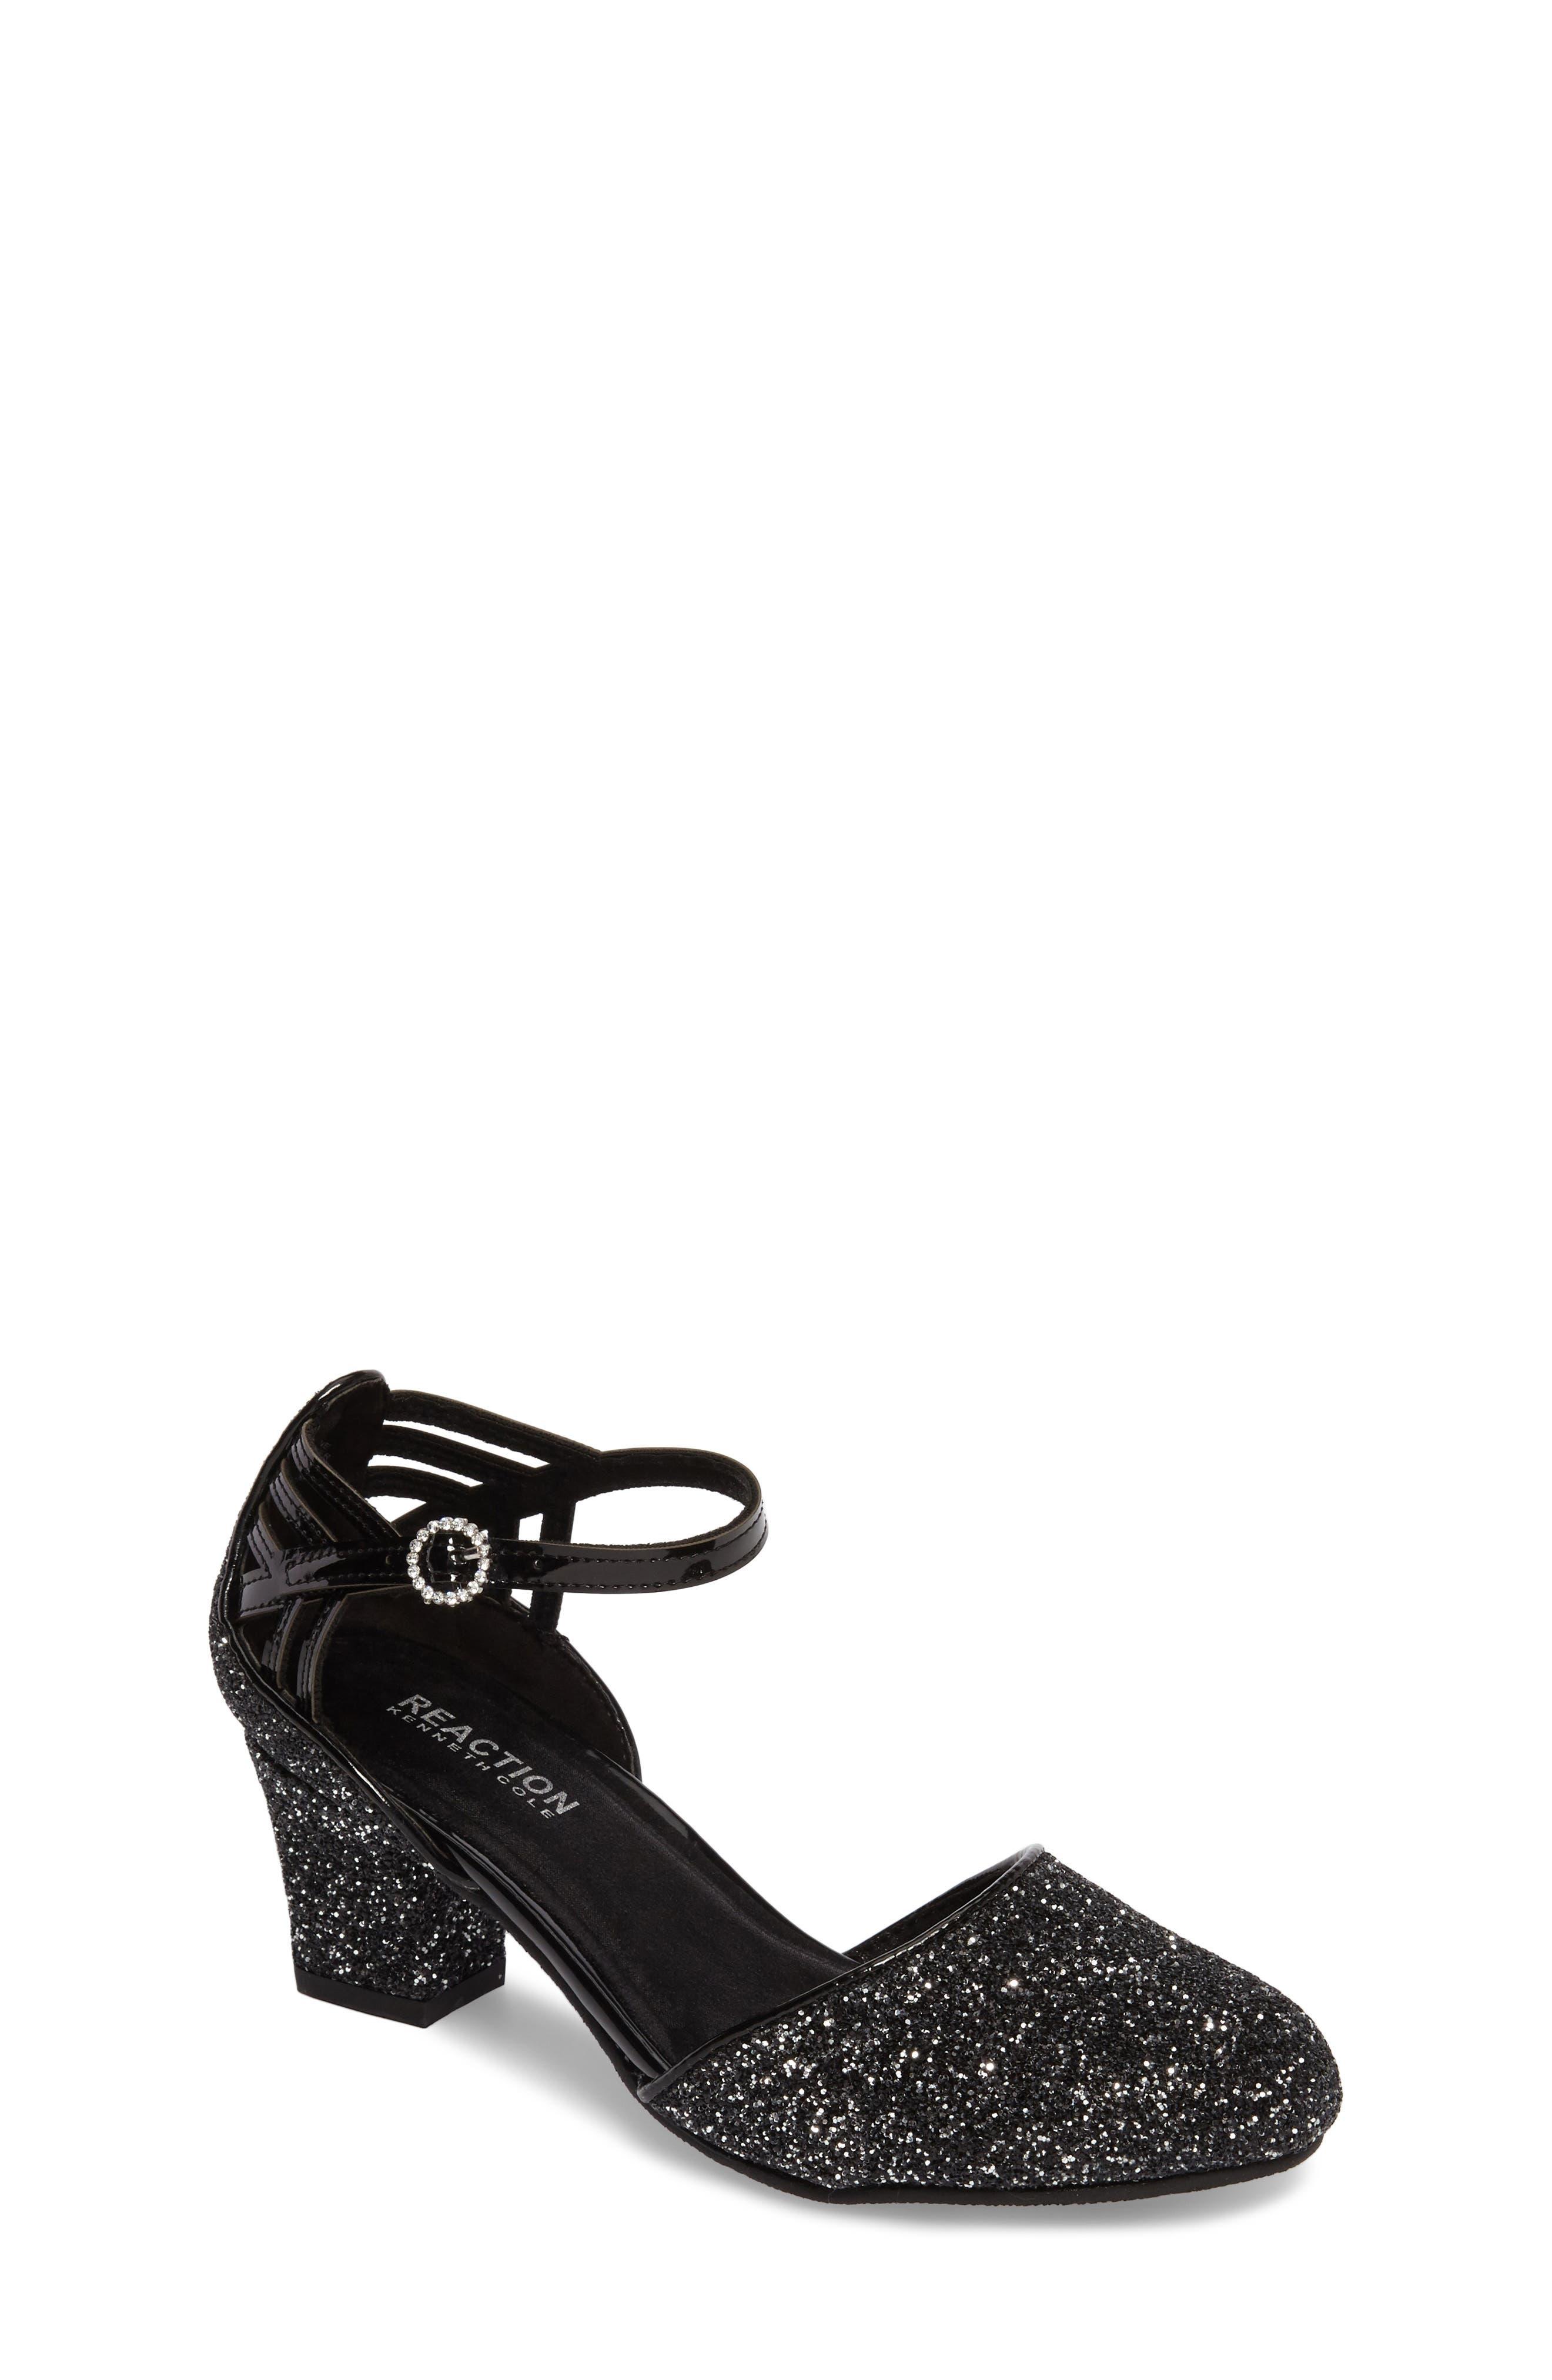 Kenneth Cole New York Sarah Shine Pump,                         Main,                         color, Black Glitter